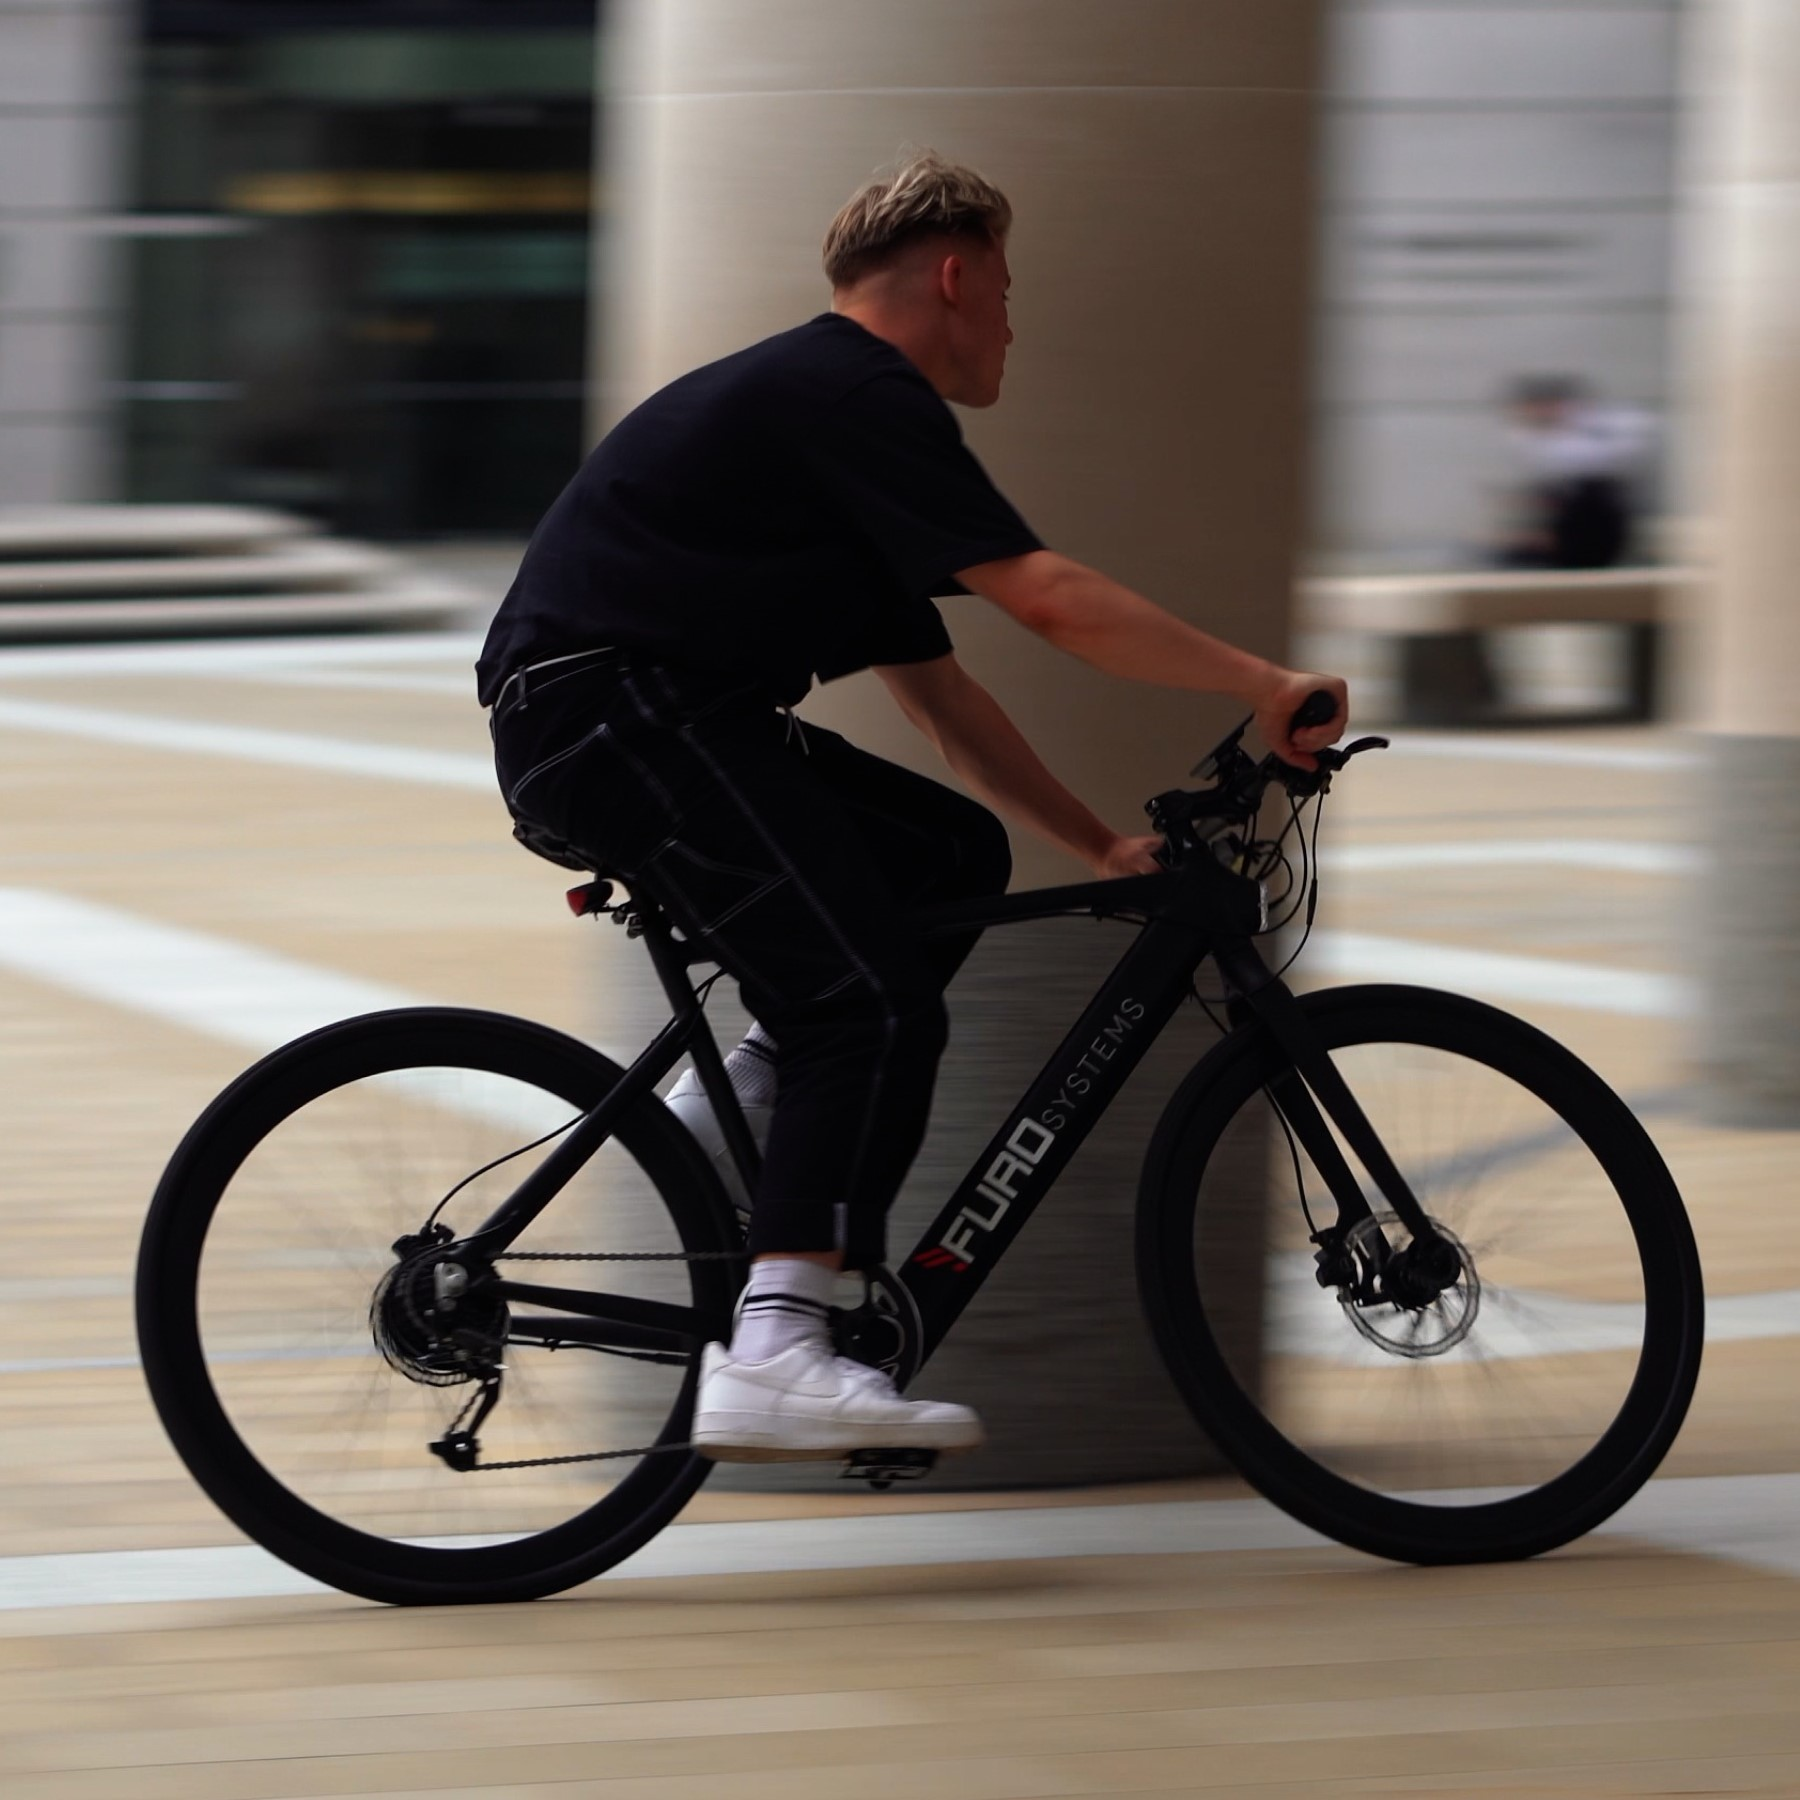 FuroSystems Aventa Next Generation Electric Bike